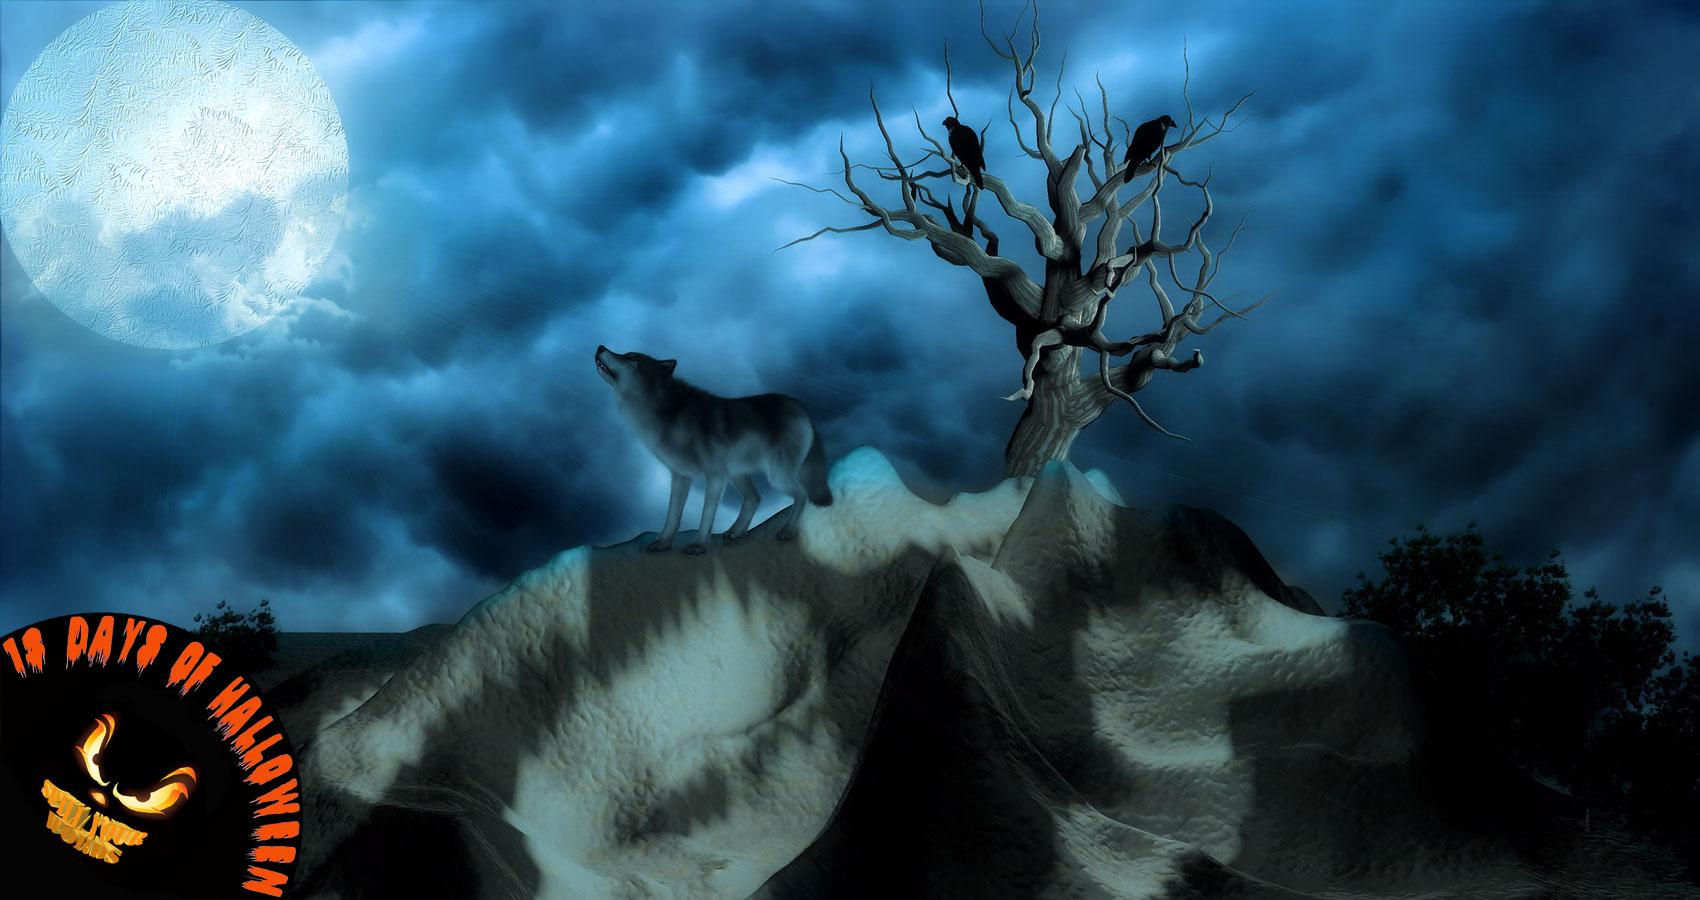 Werewolf, poetry written by N. K. Hasen at Spillwords.com